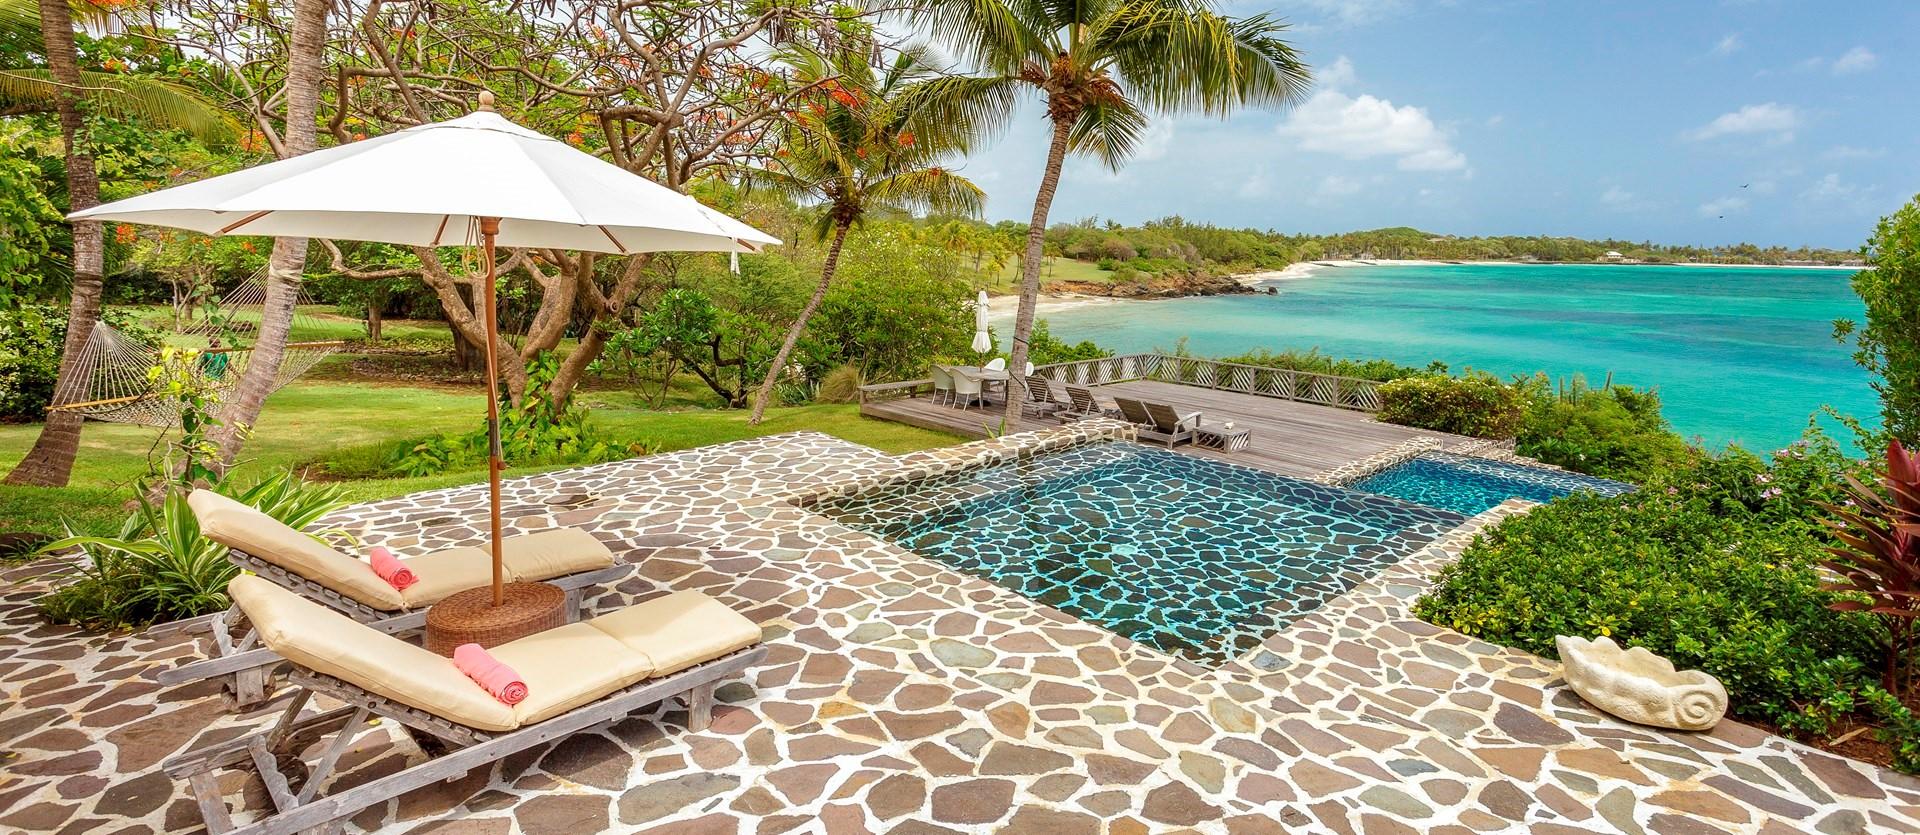 villa-moana-mustique-swimming-pool